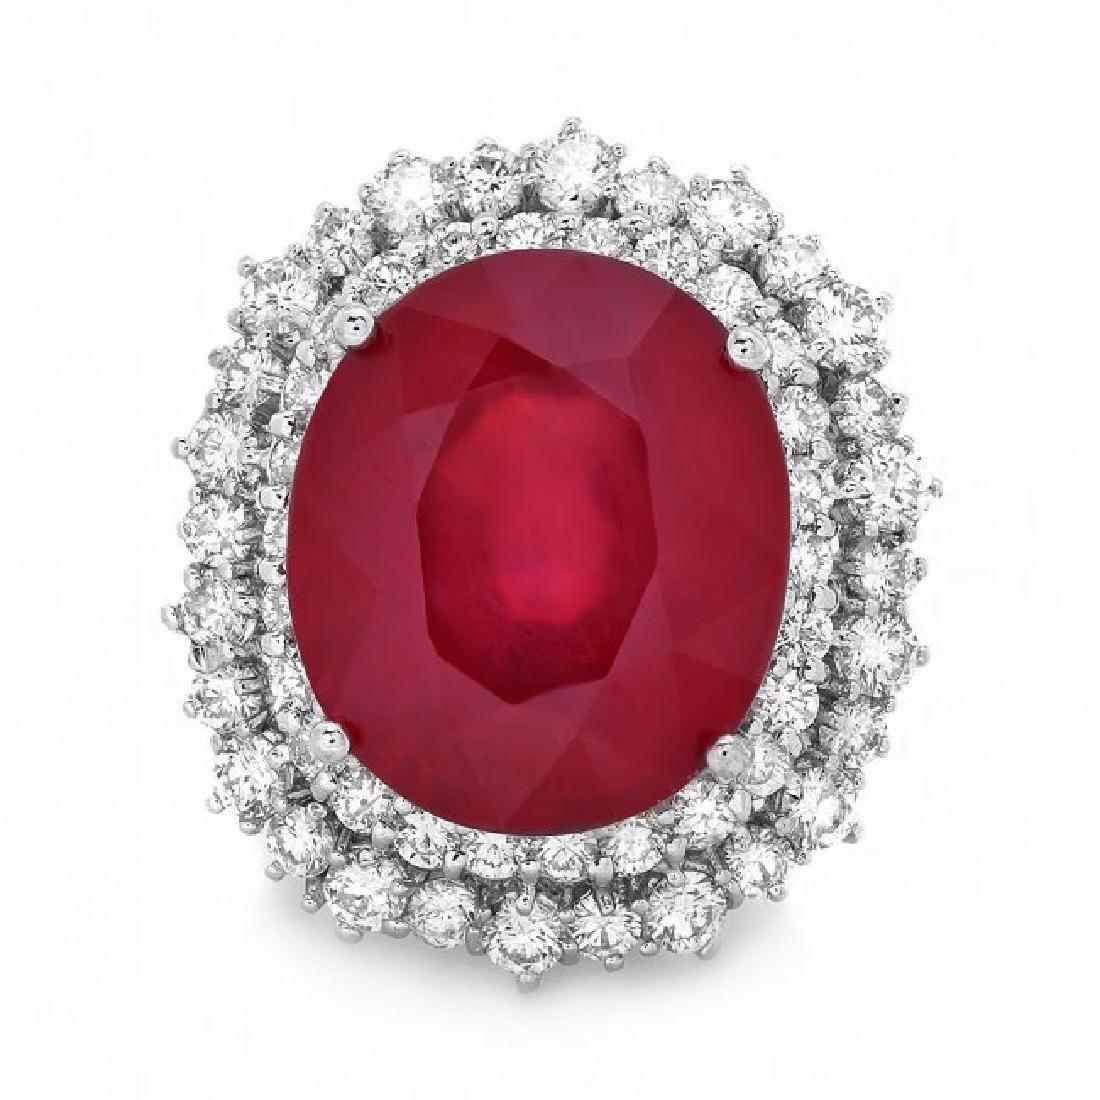 14k White Gold 18.00ct Ruby 2.00ct Diamond Ring - 2